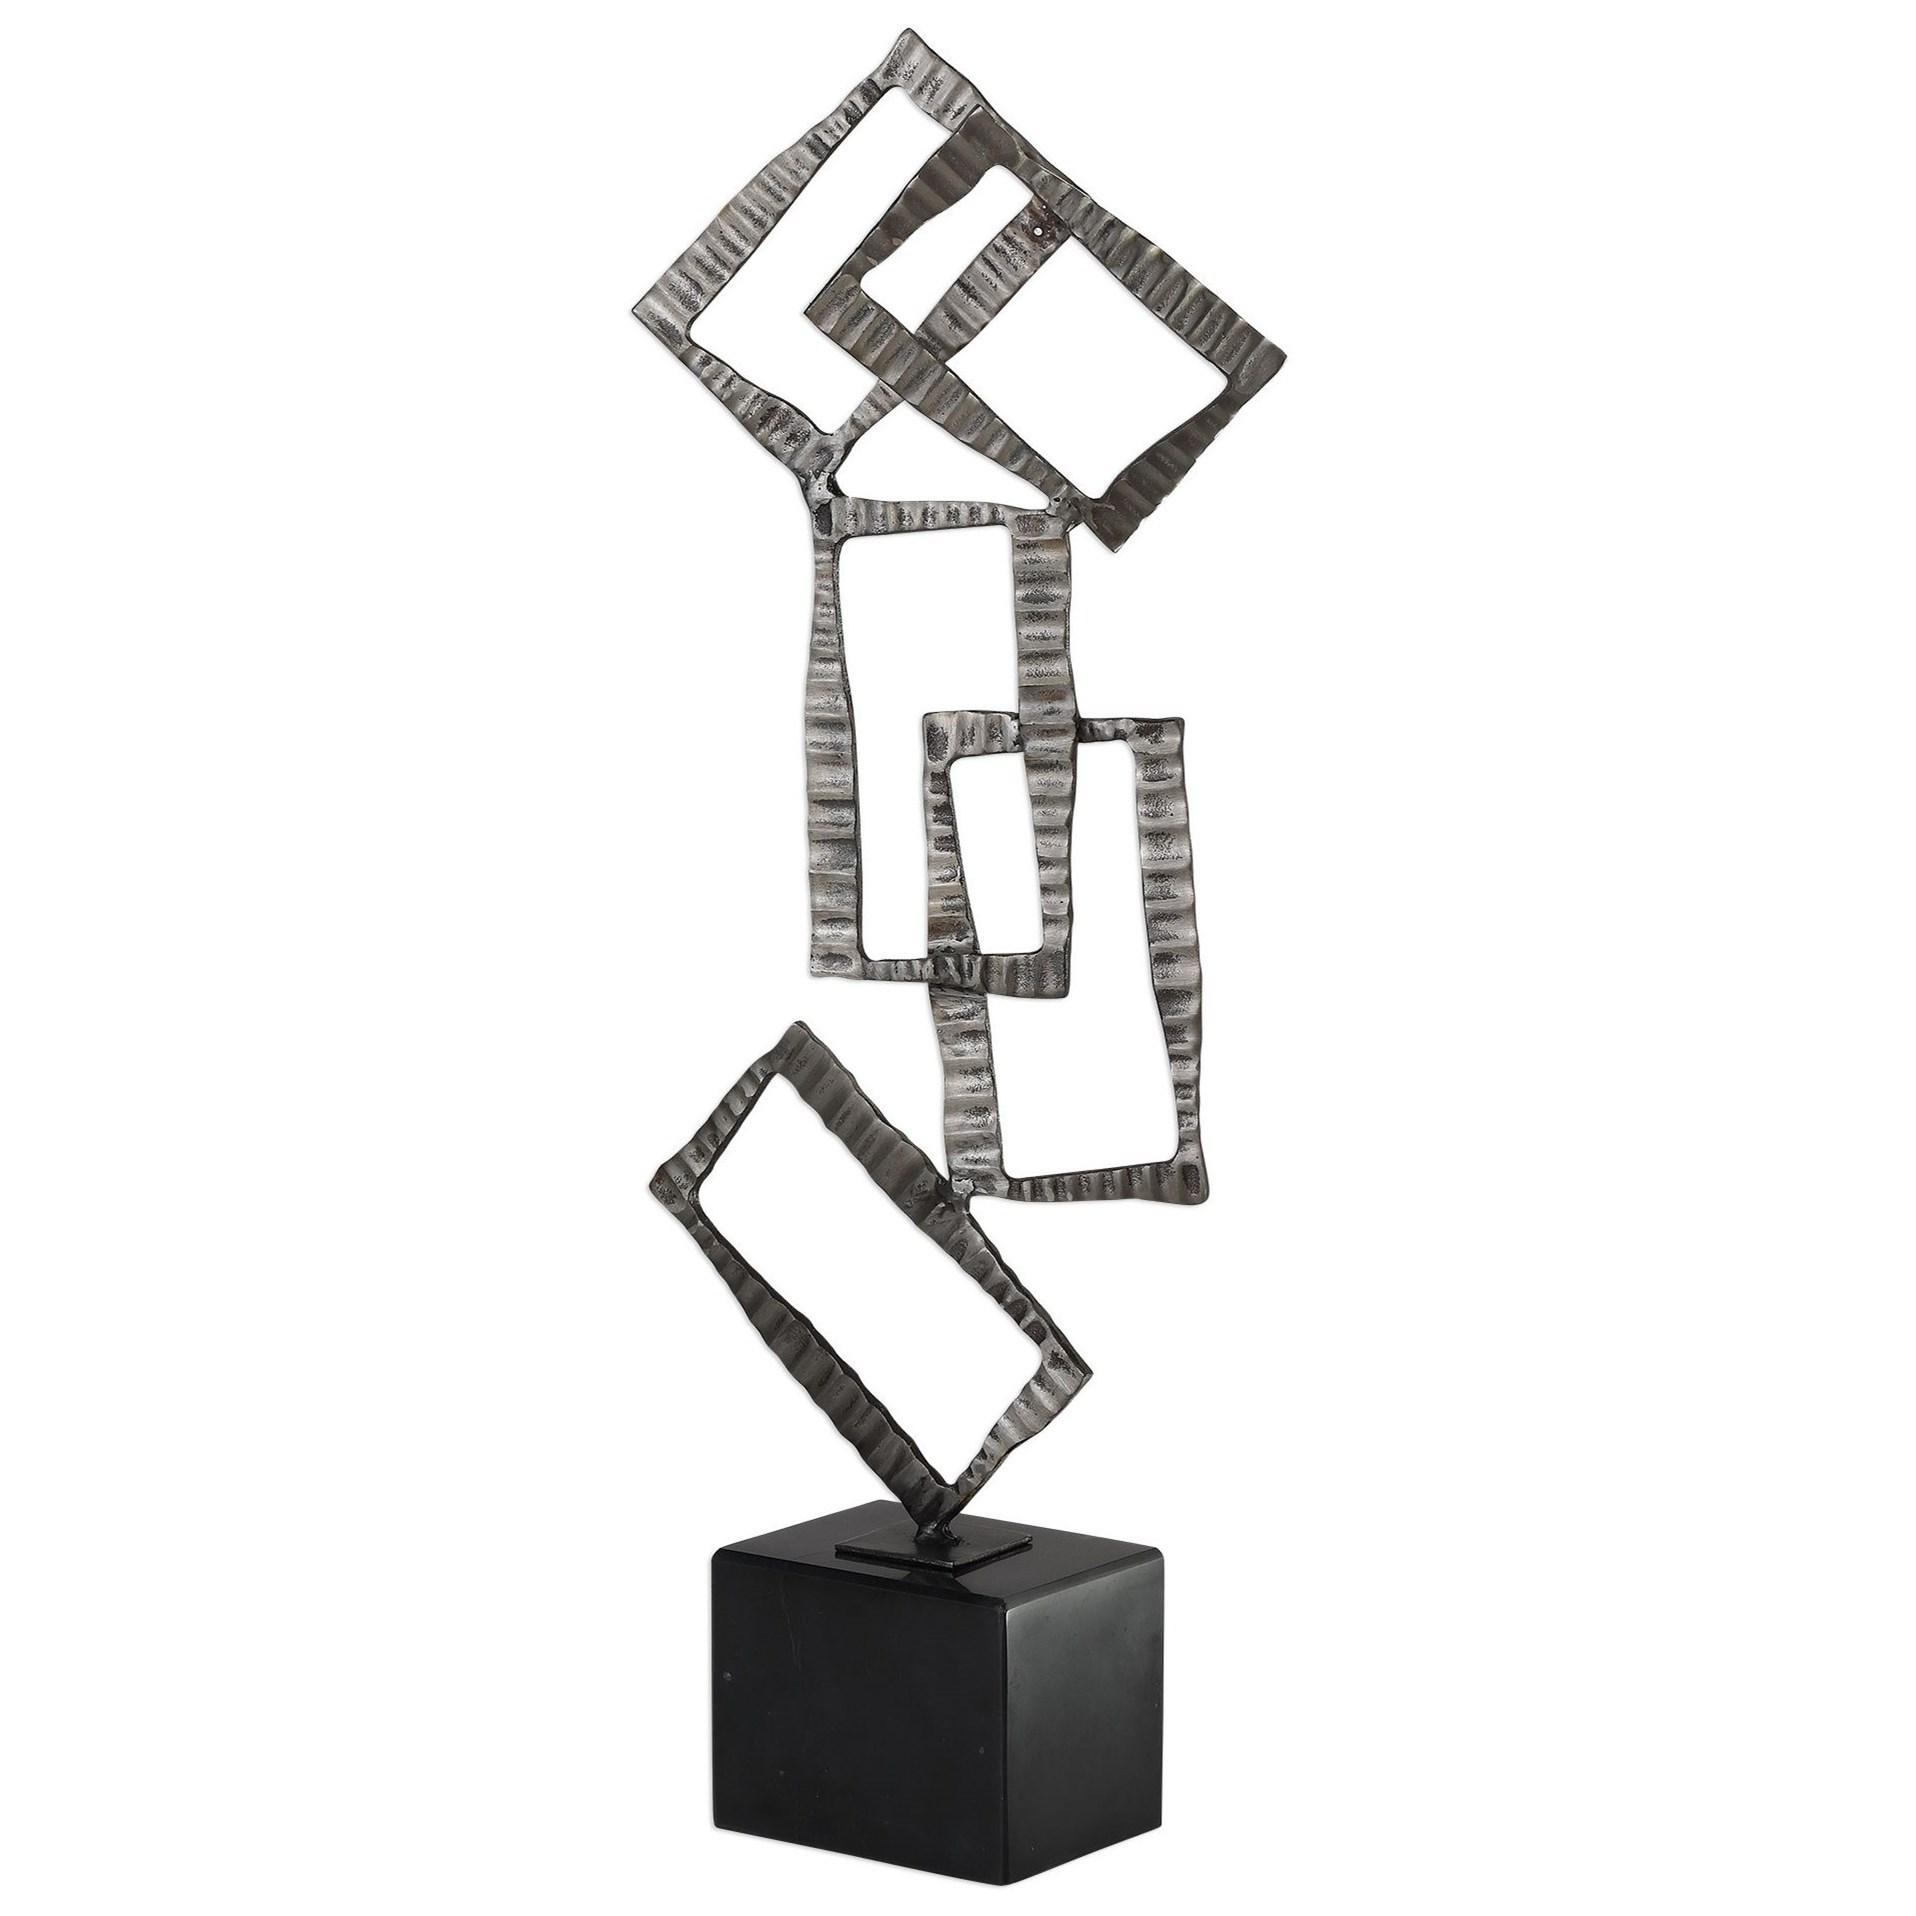 Talal Brushed Nickel Sculpture